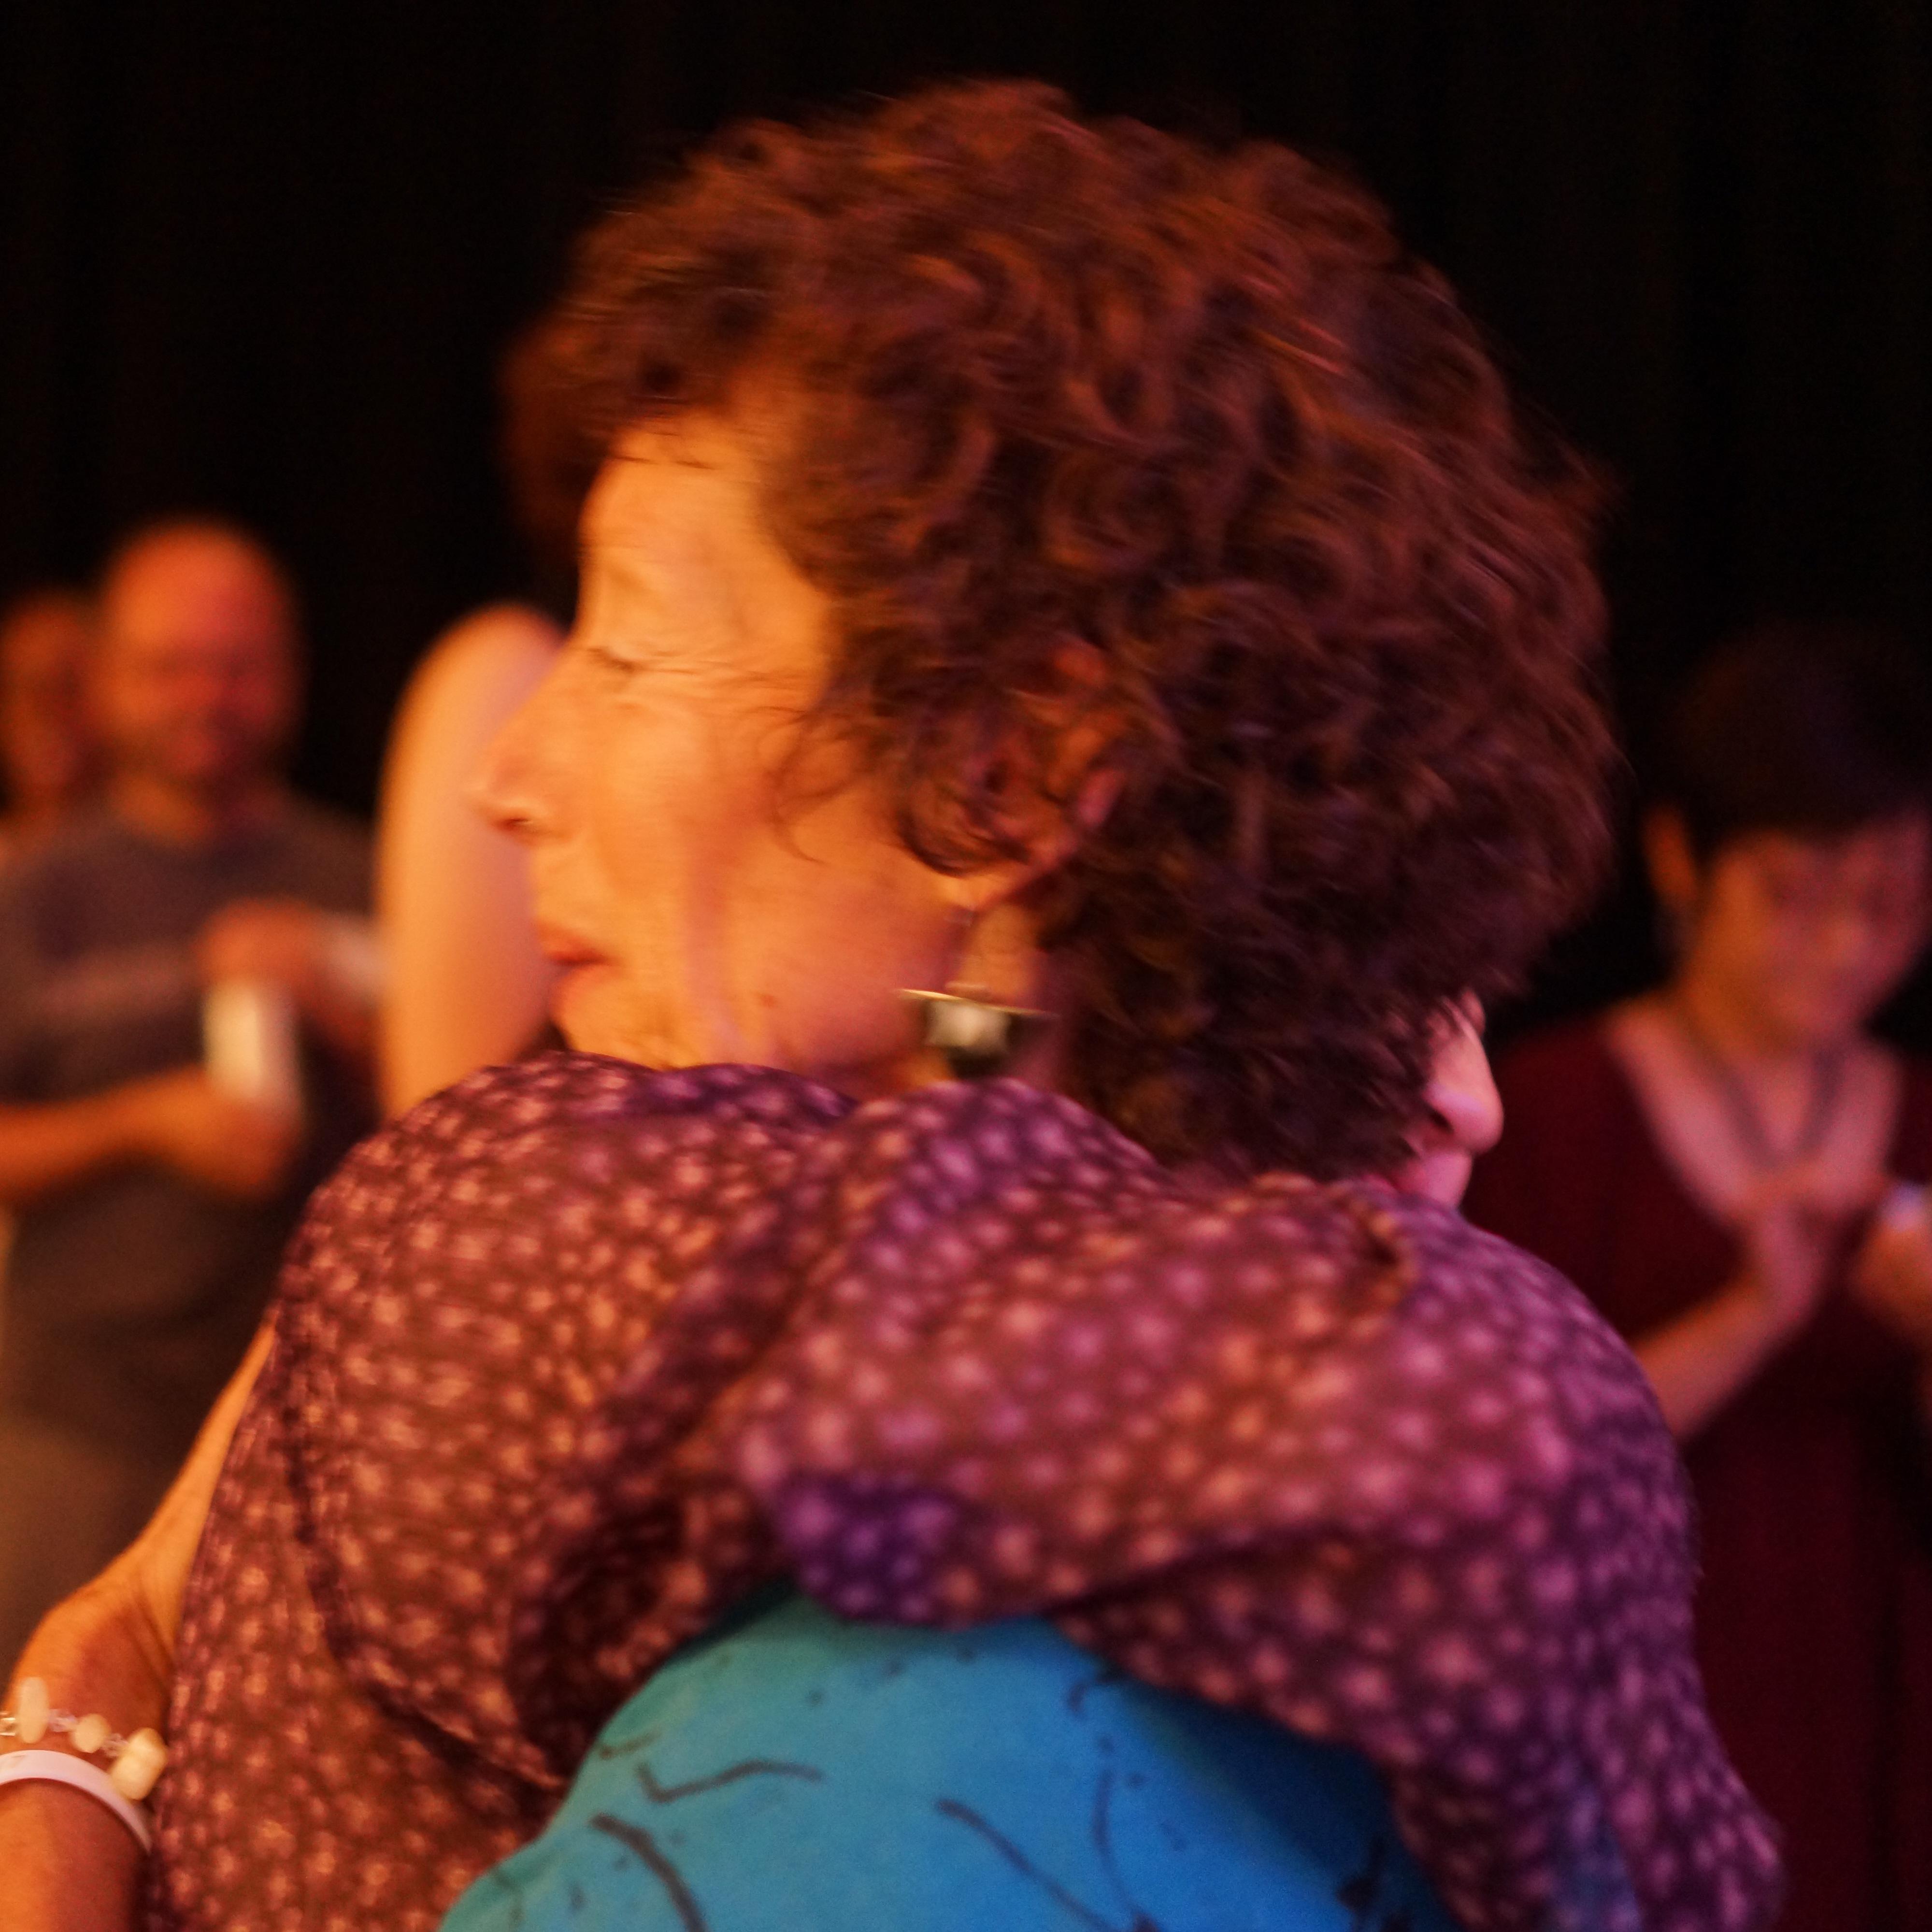 Image : friend embracing Nancy